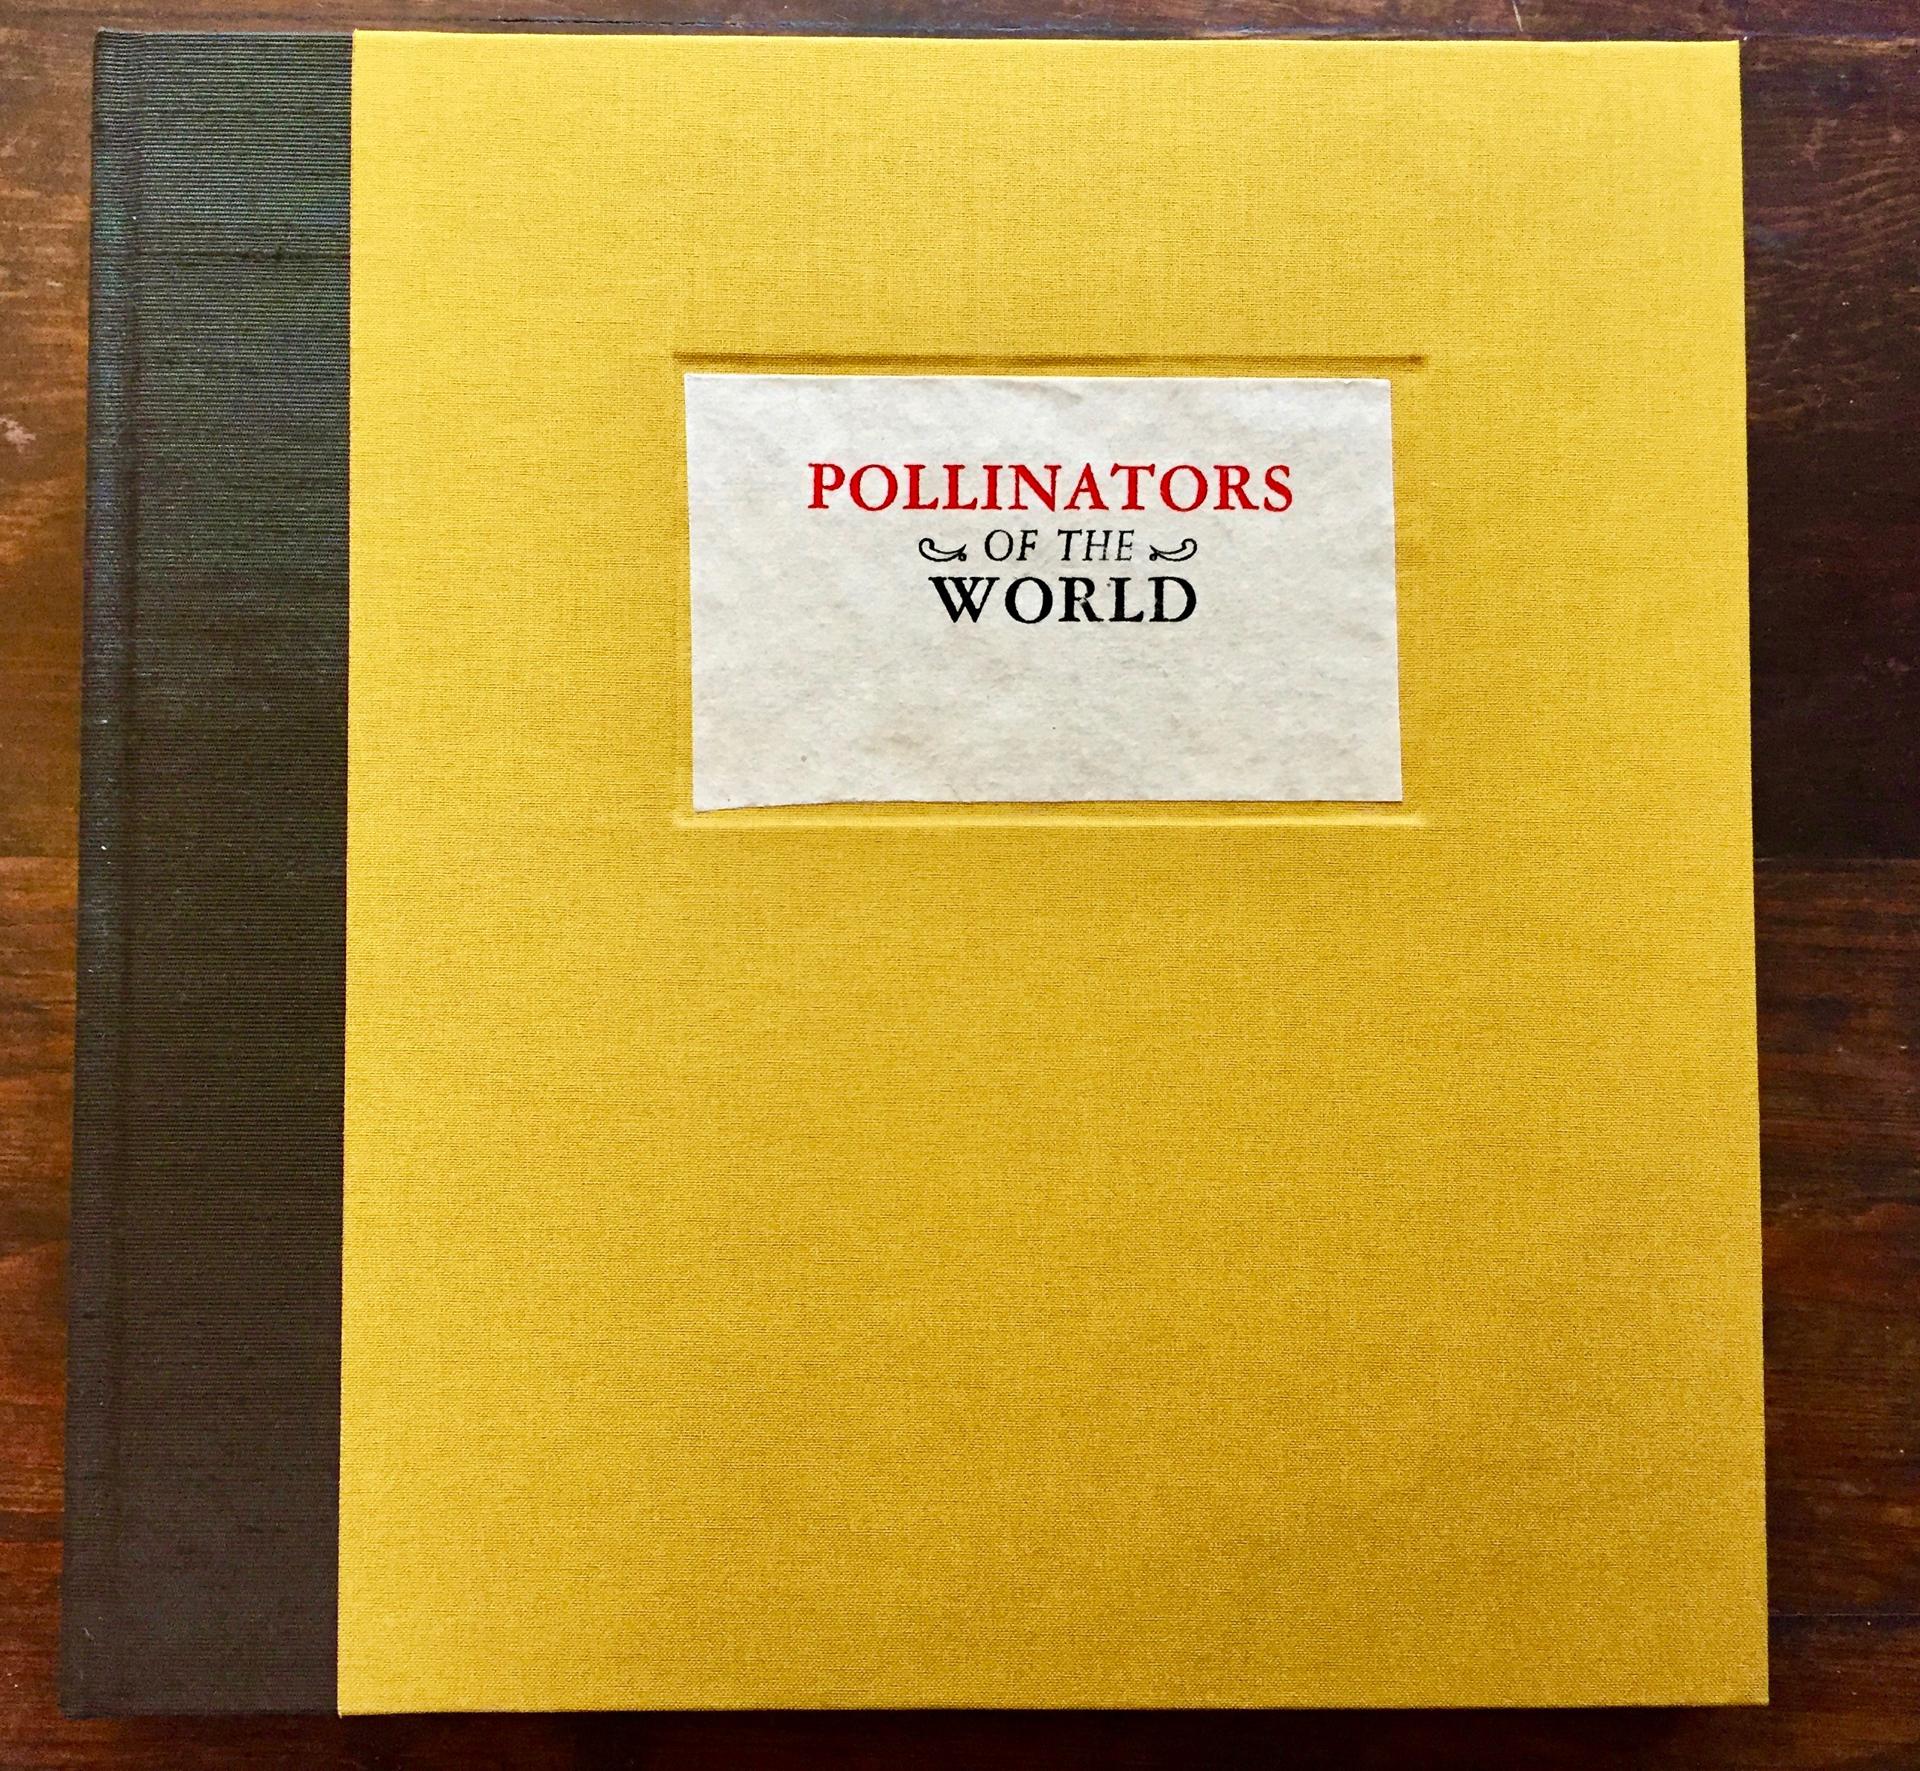 Pollinators of the World by Charles Jones